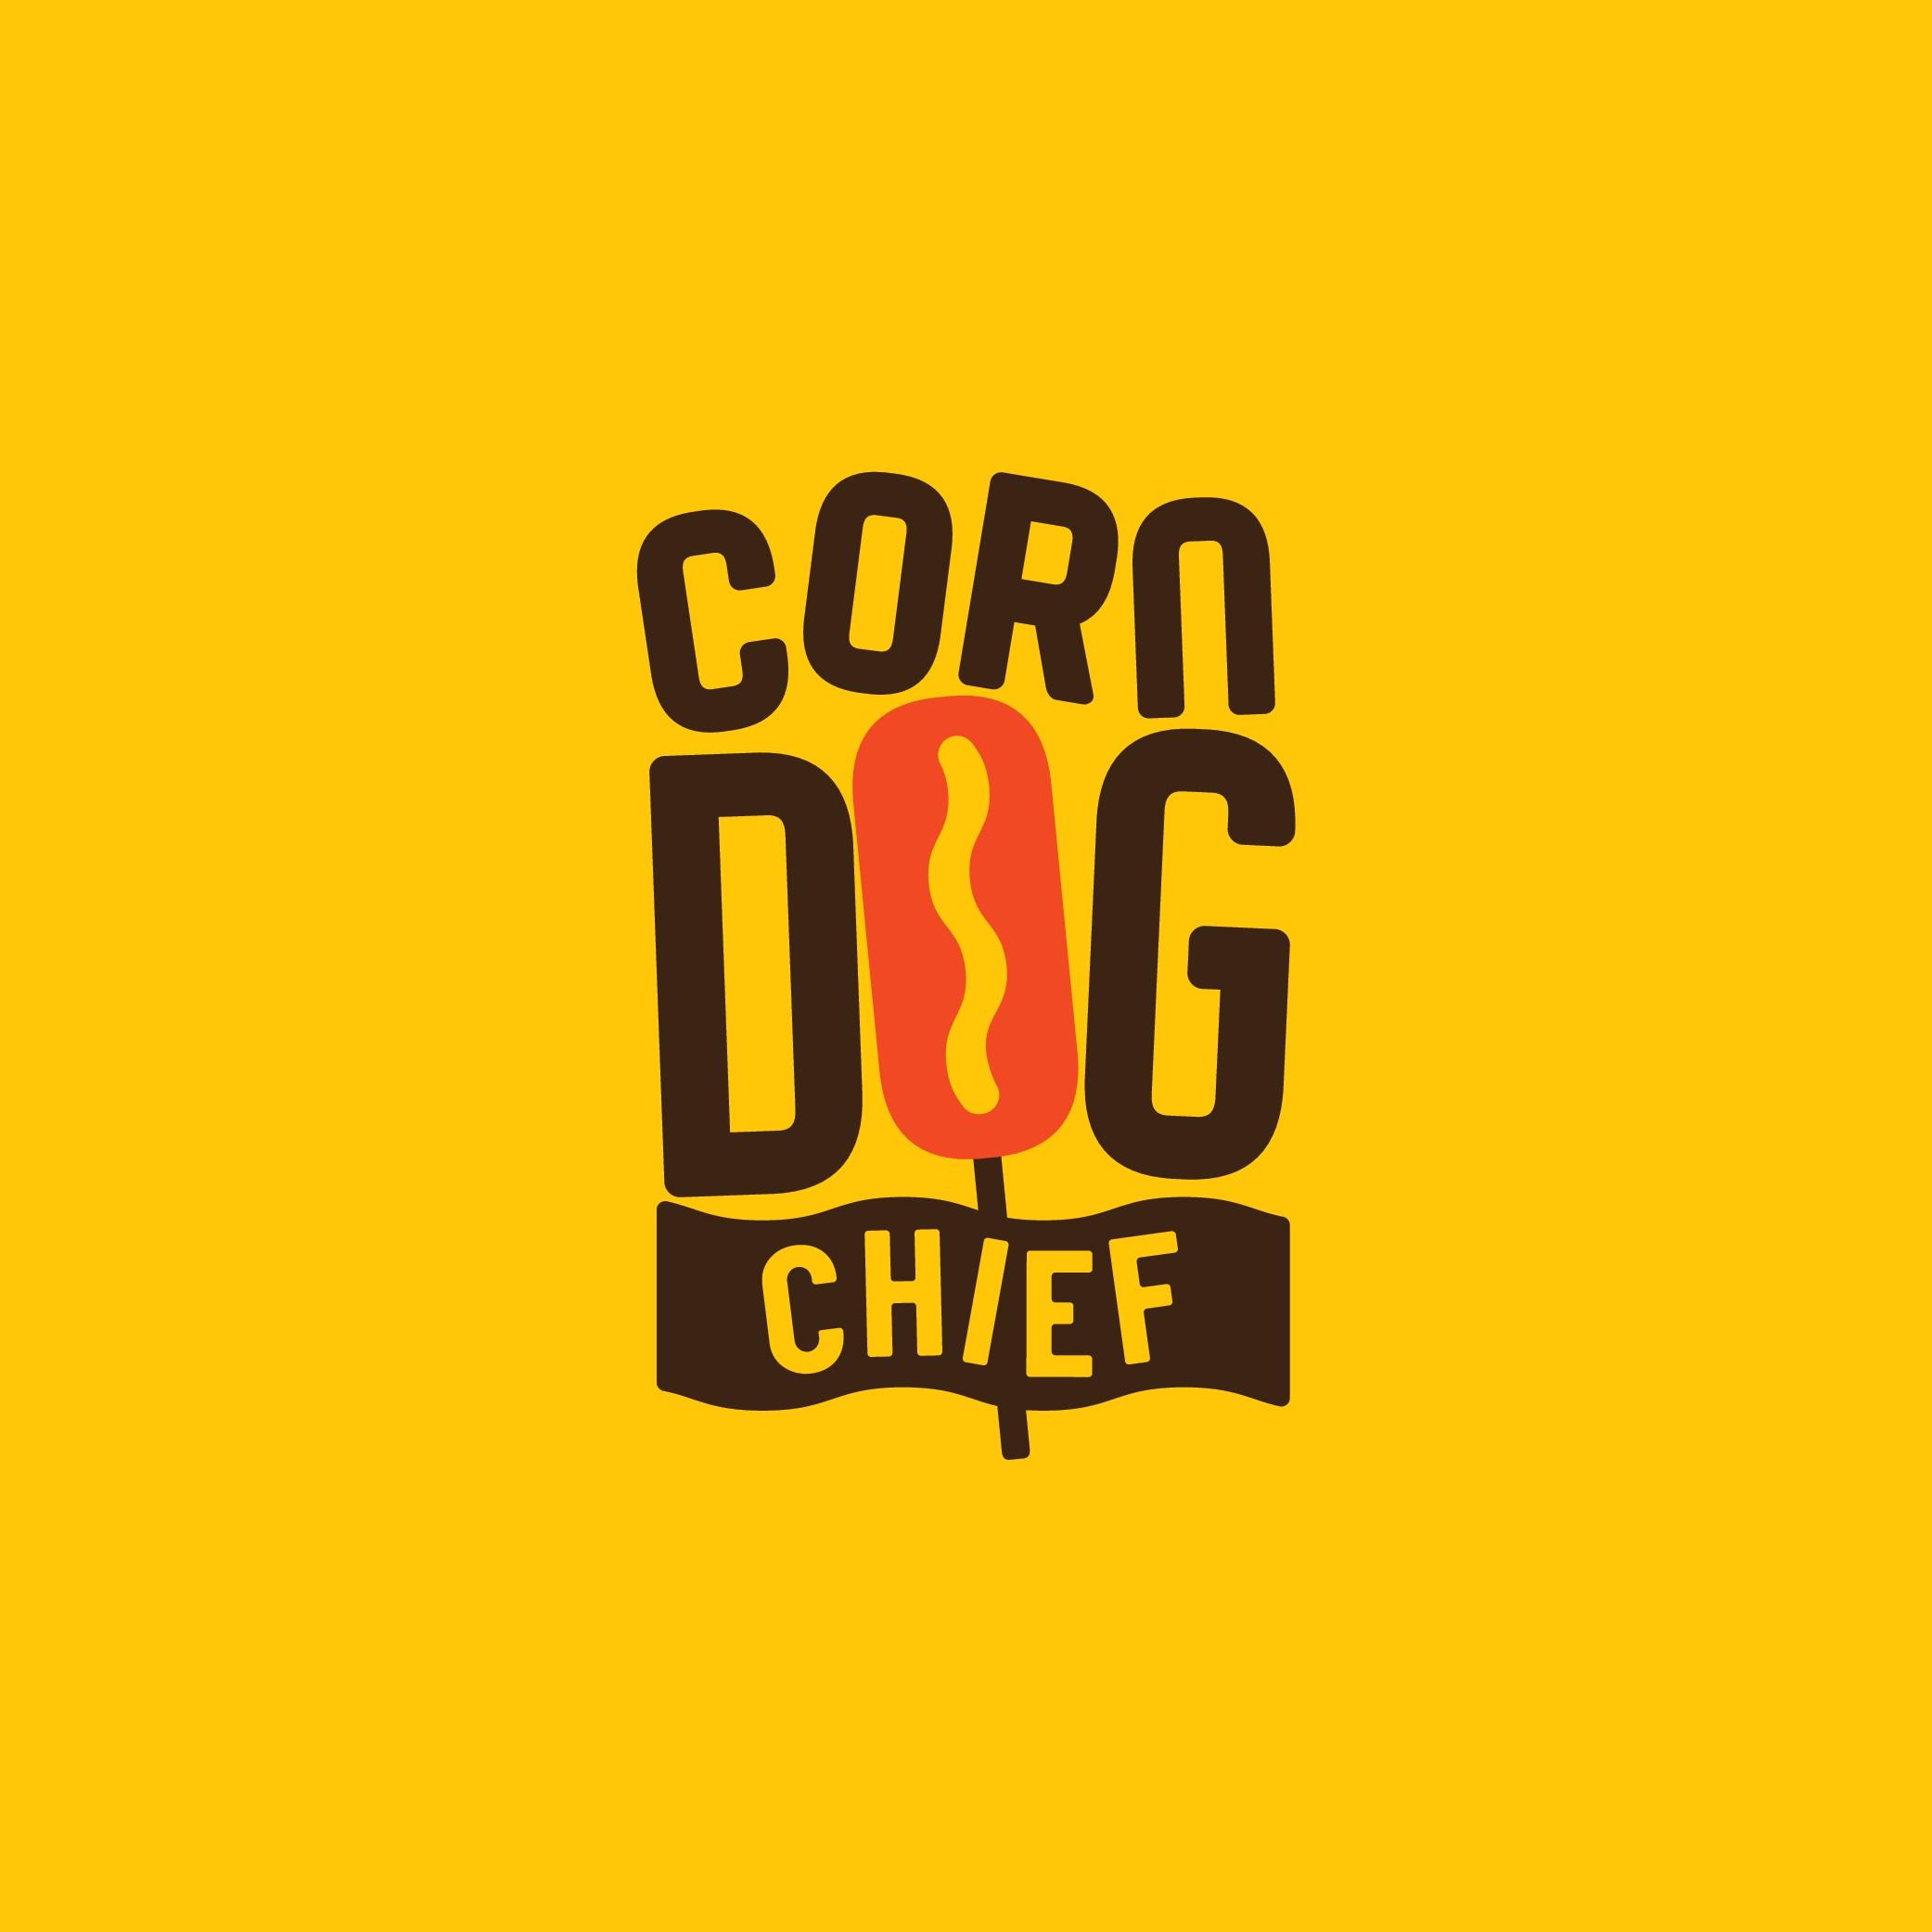 We need a modern logo for a Corn Dog restaurant